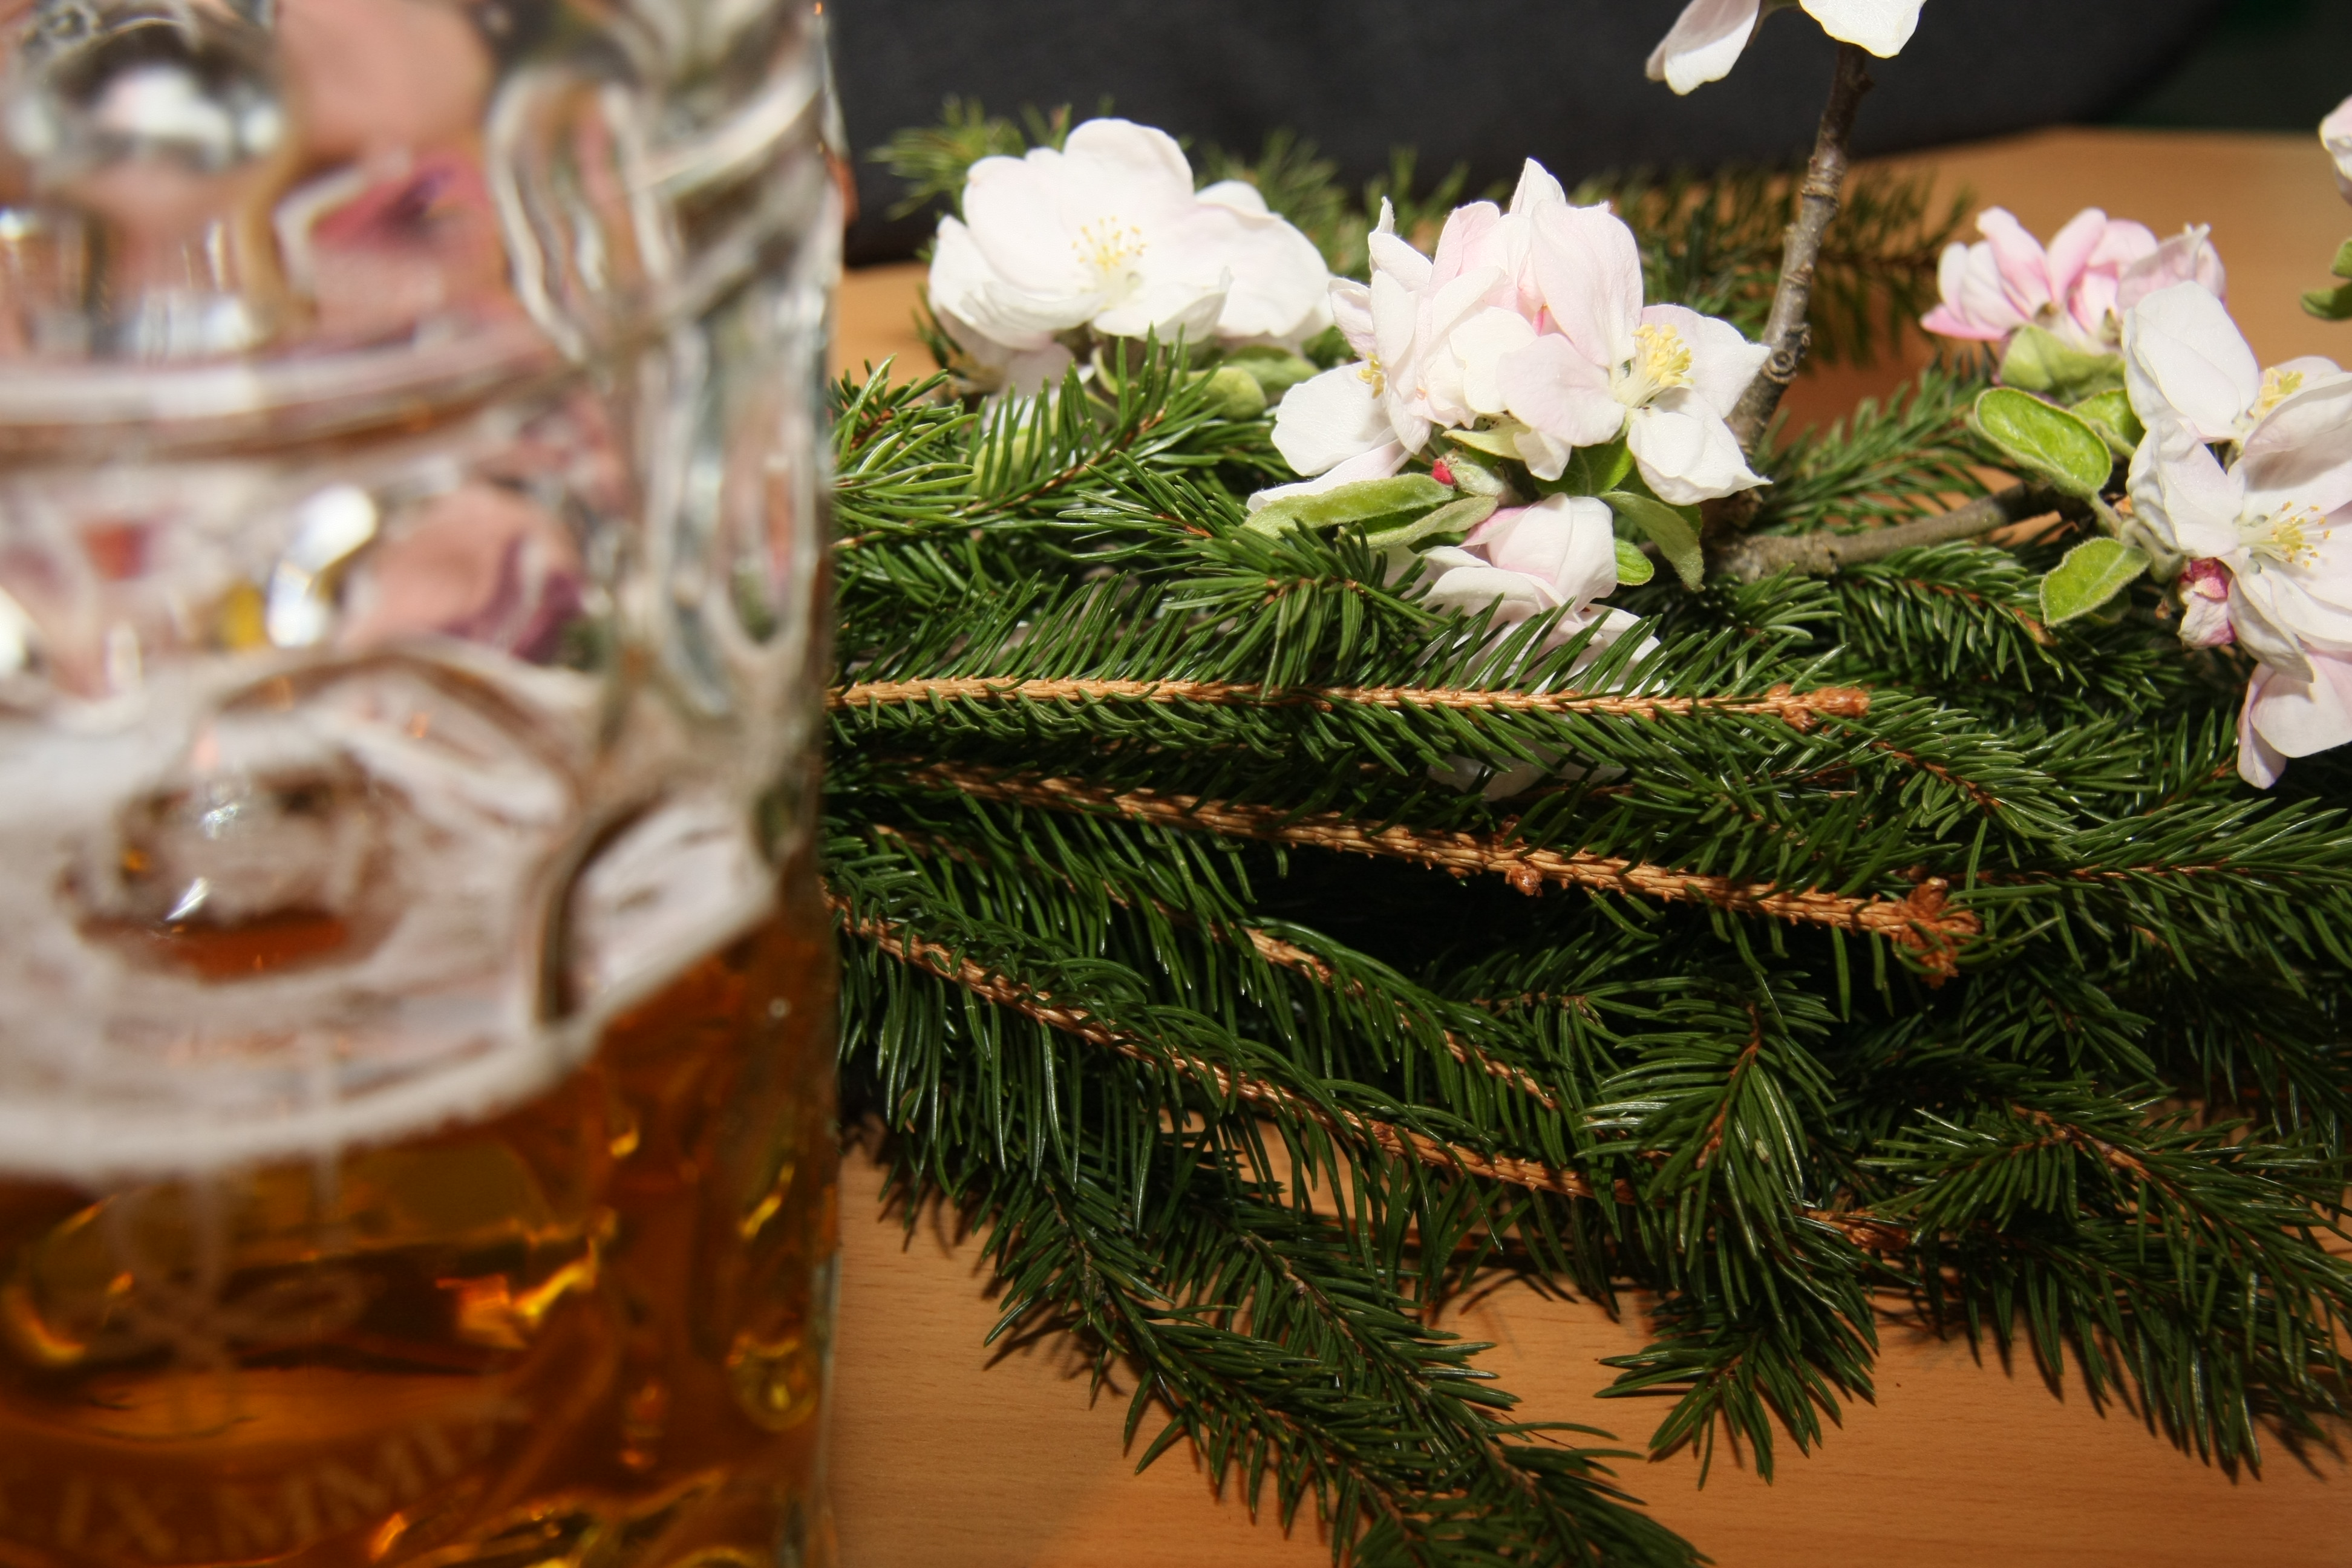 Bierjägerkneipe 2015